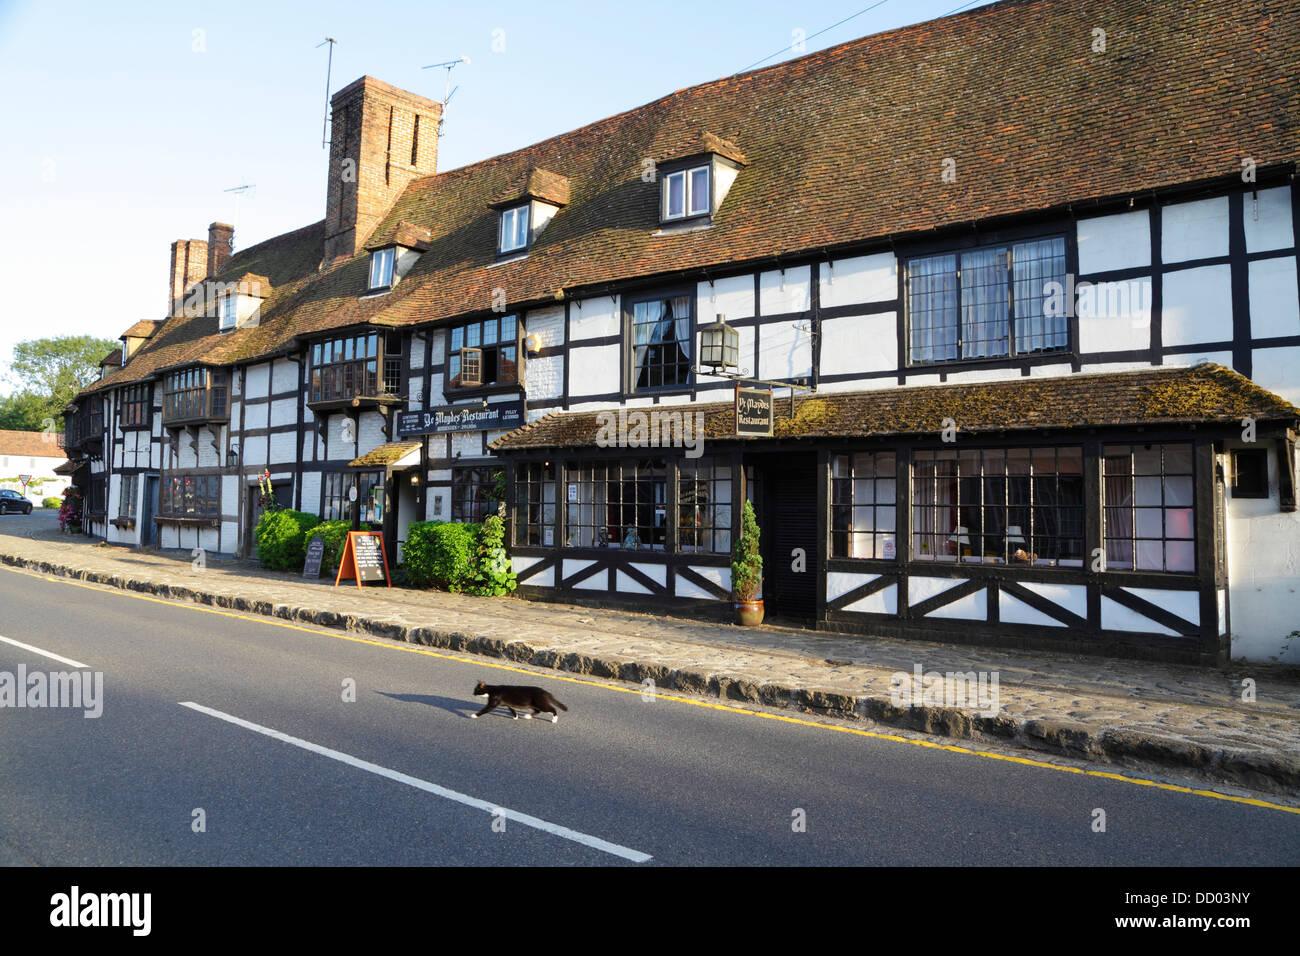 Cat crossing road in front of medieval weavers' houses, Maydes Restaurant, Biddenden, Kent, England, UK - Stock Image